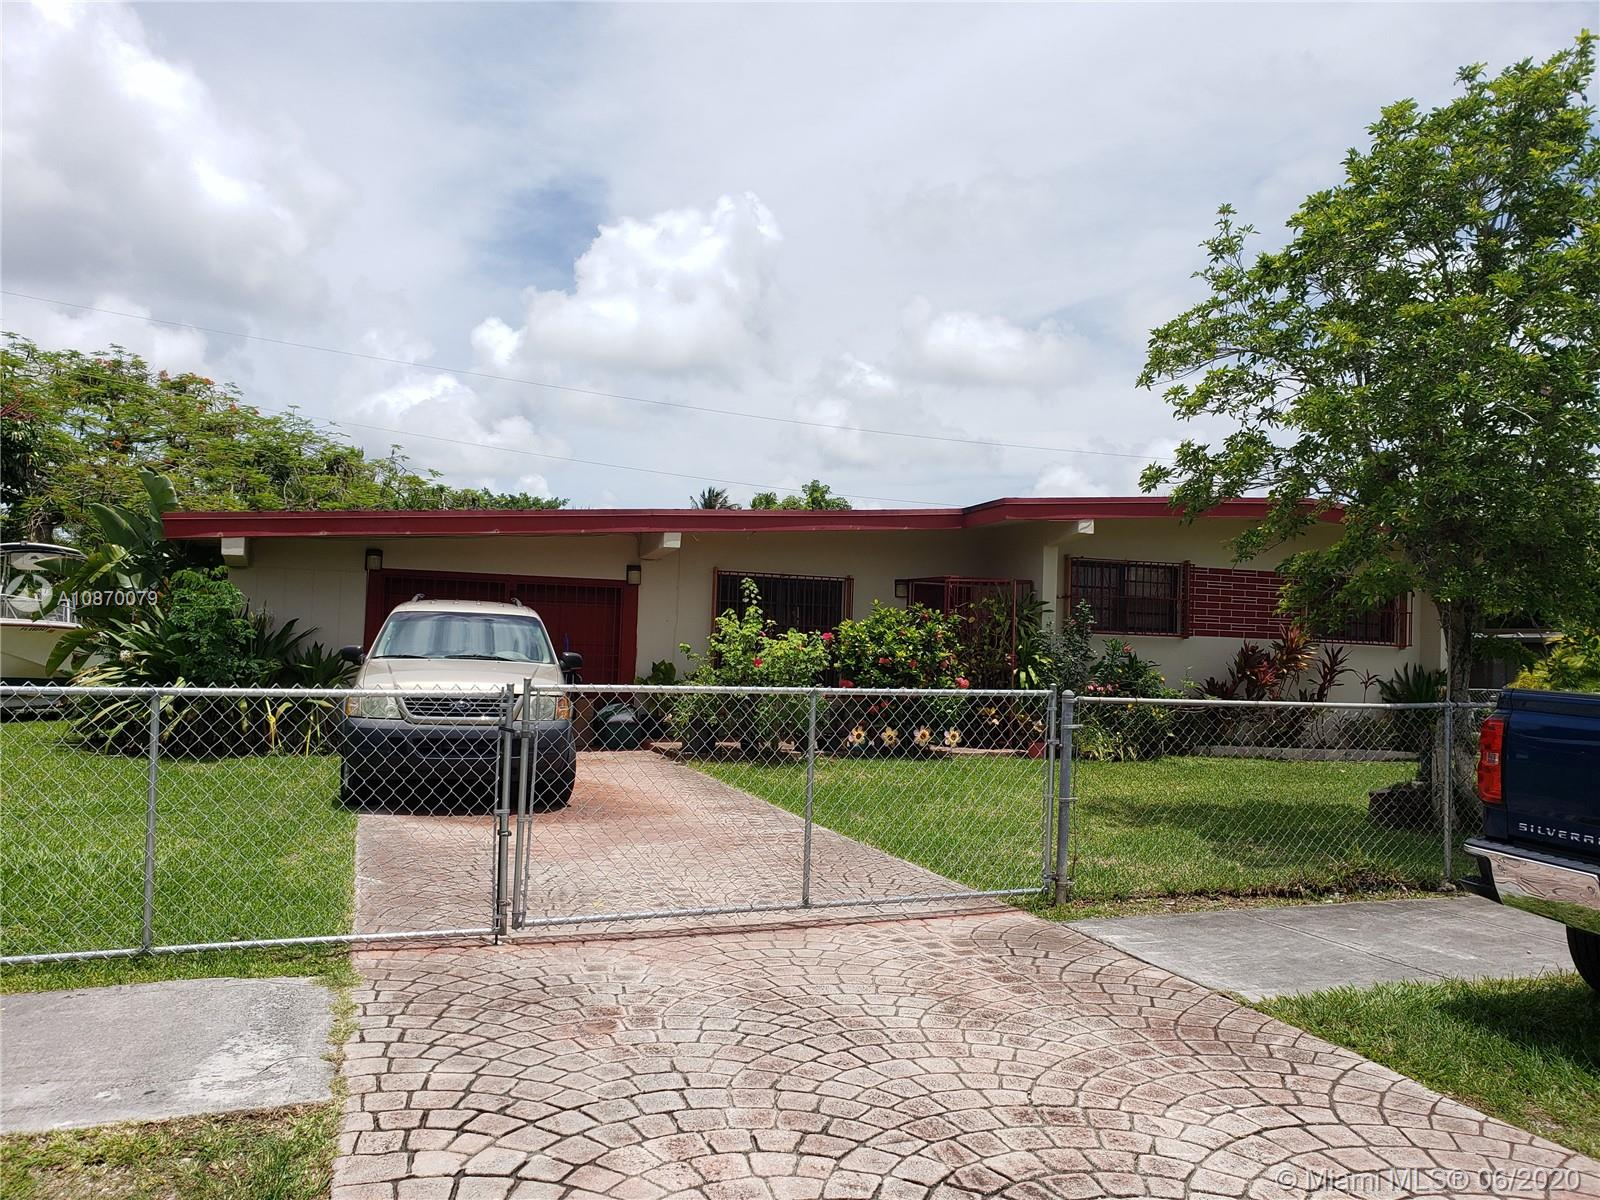 27101 Sw 144th Ct Property Photo